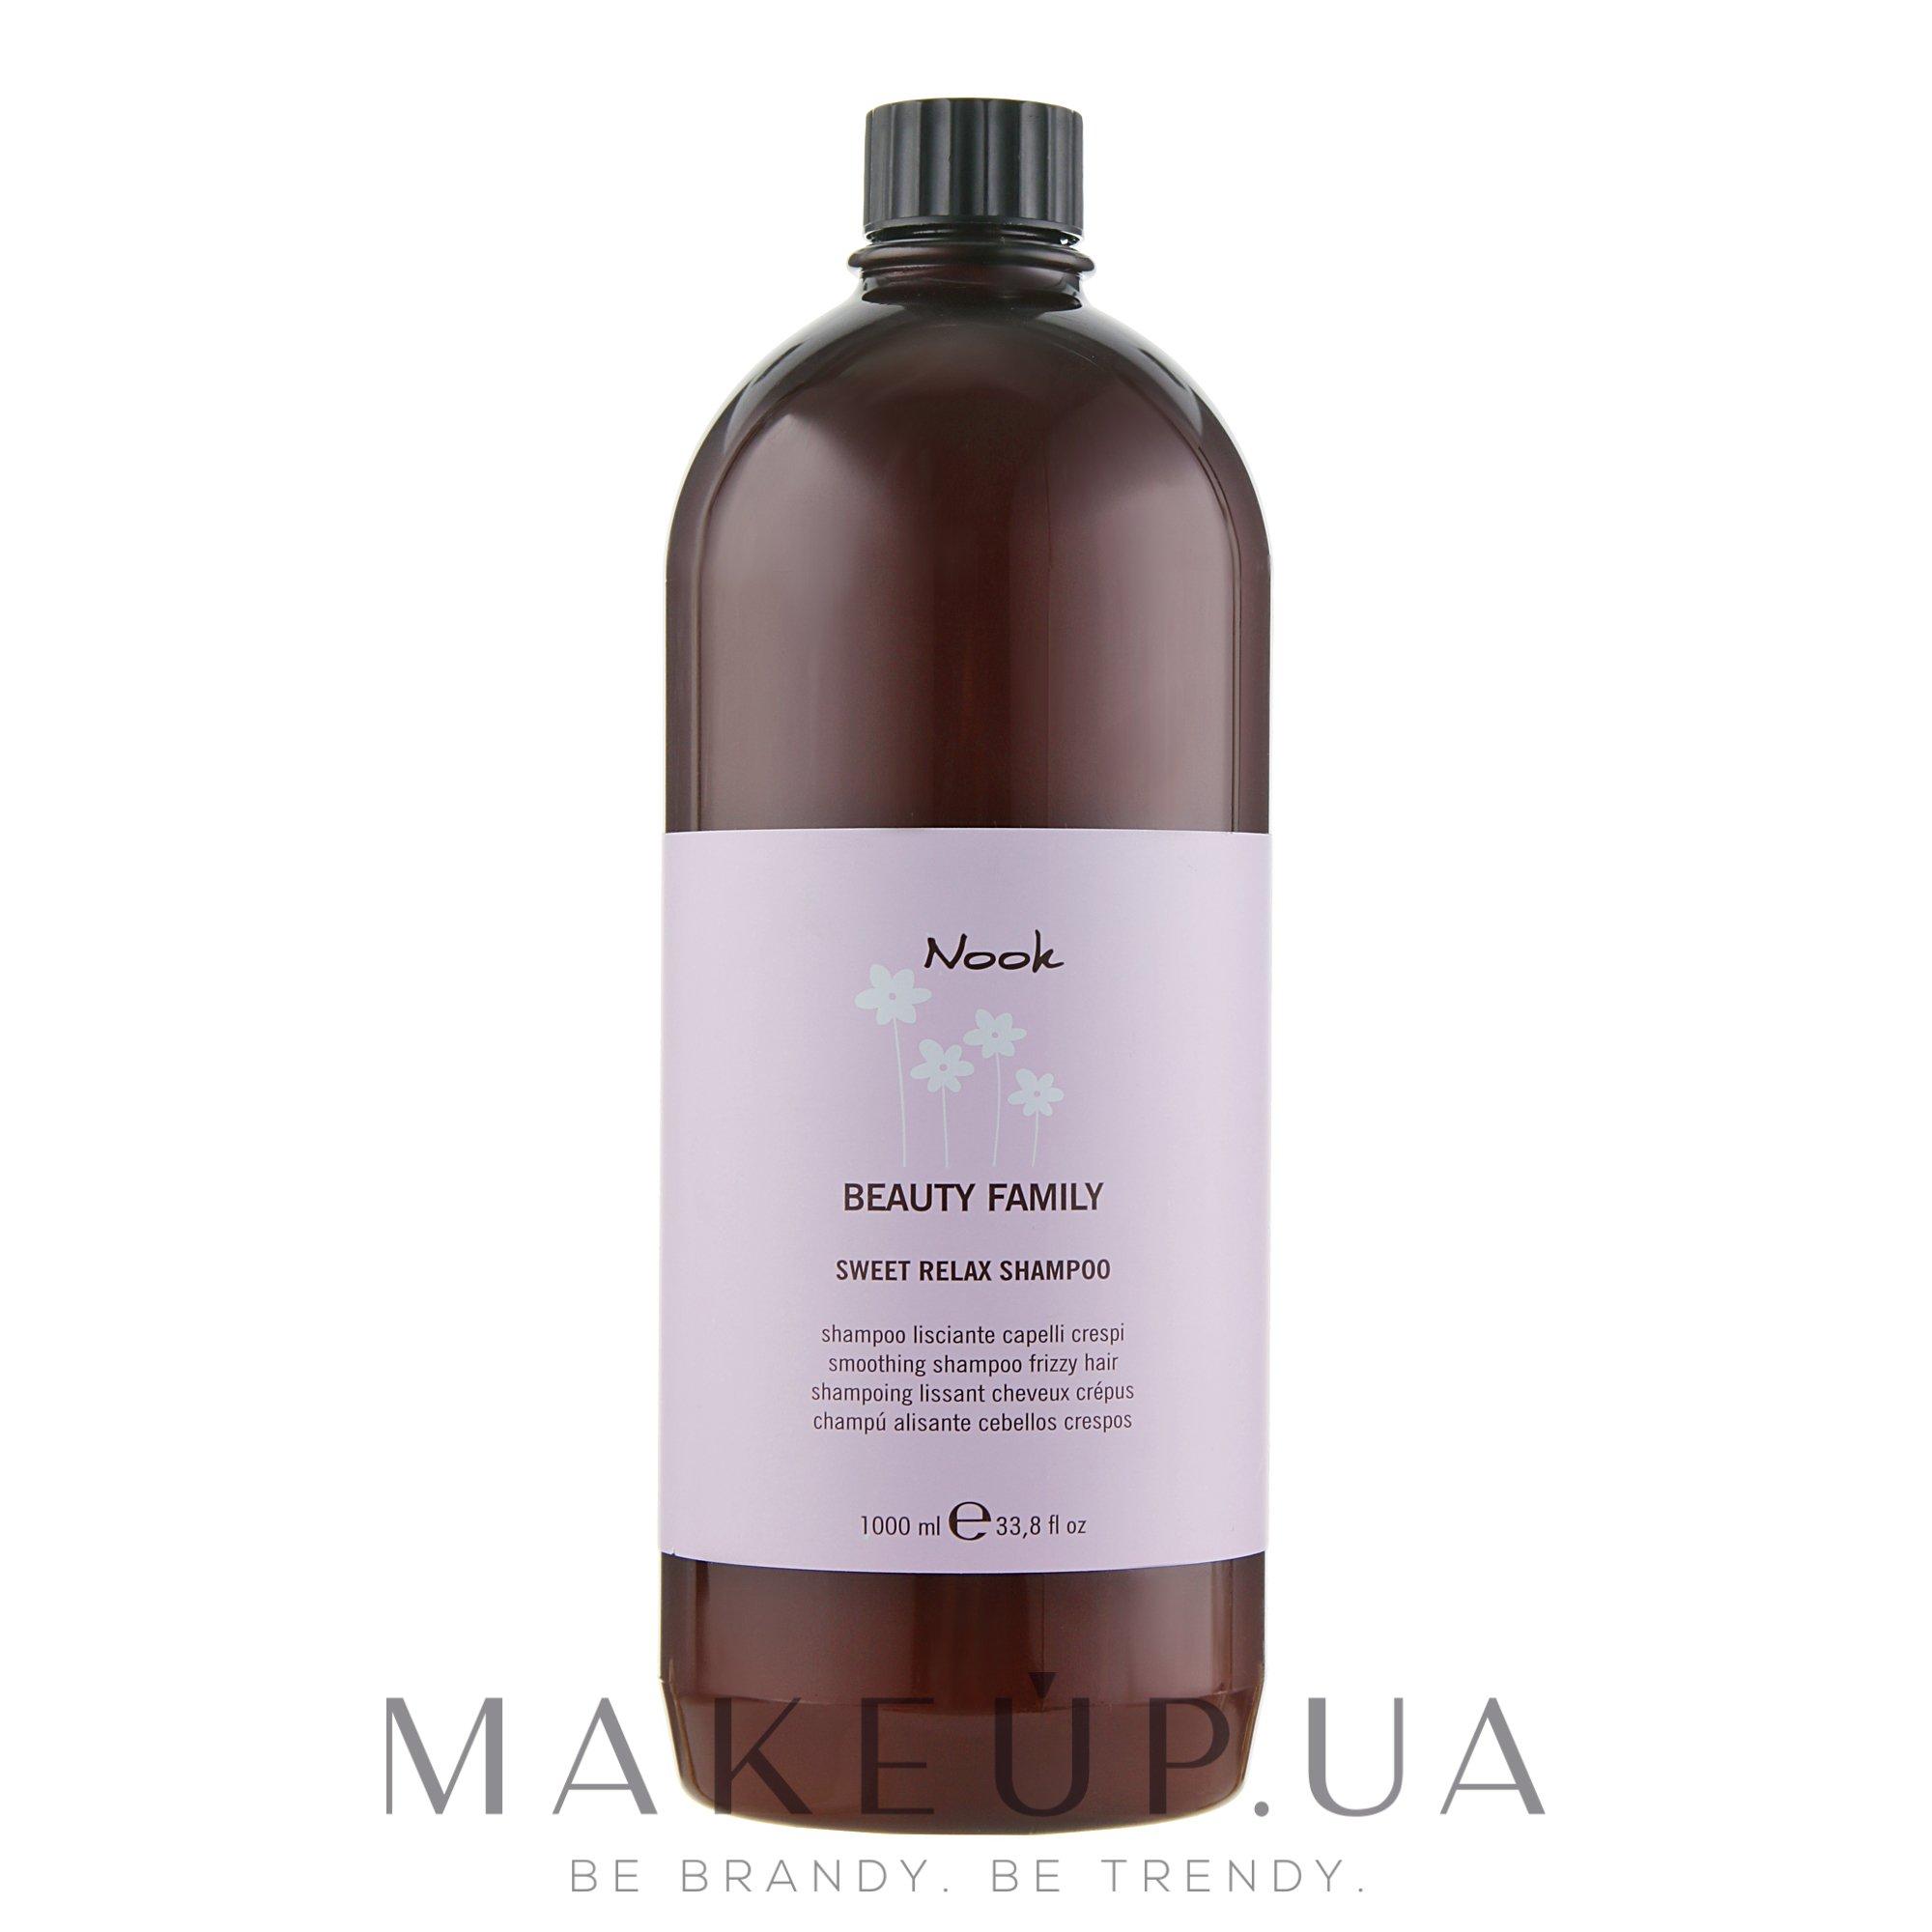 Выравнивающий и разглаживающий шампунь - Nook Beauty Family Sweet Relax Shampoo PH 5.5 — фото 1000ml